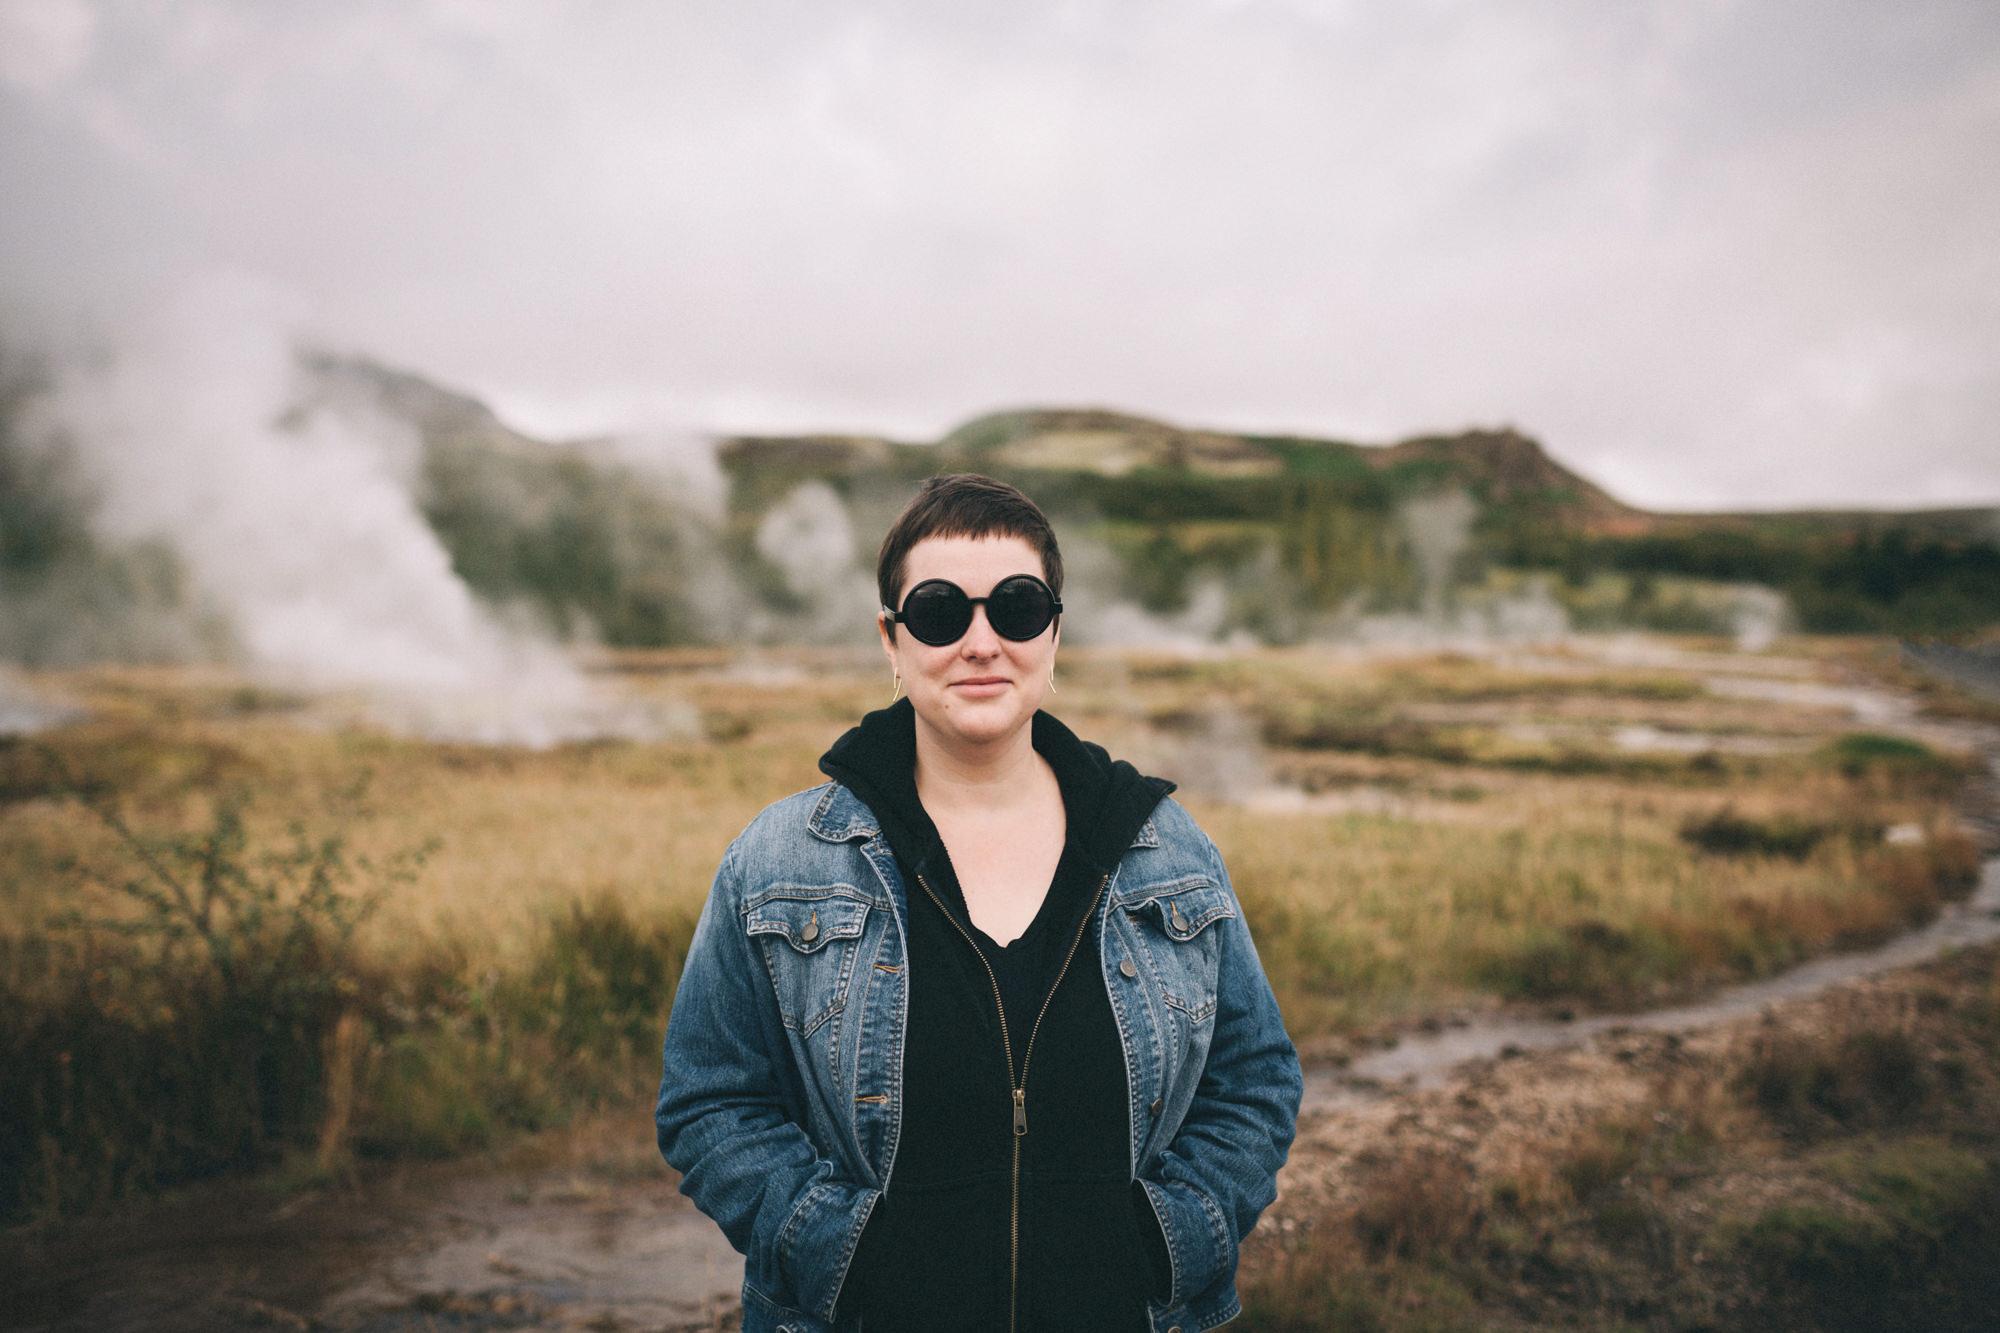 Sarah-Katherine-Davis-Photography-Iceland-Adventure-Elopement-Photographer-Louisville-Kentucky-Wedding-Photographer-Travel-Vik-Beach-Engagement-Session-Cozy-Iceland-South-Coast-120edit.jpg